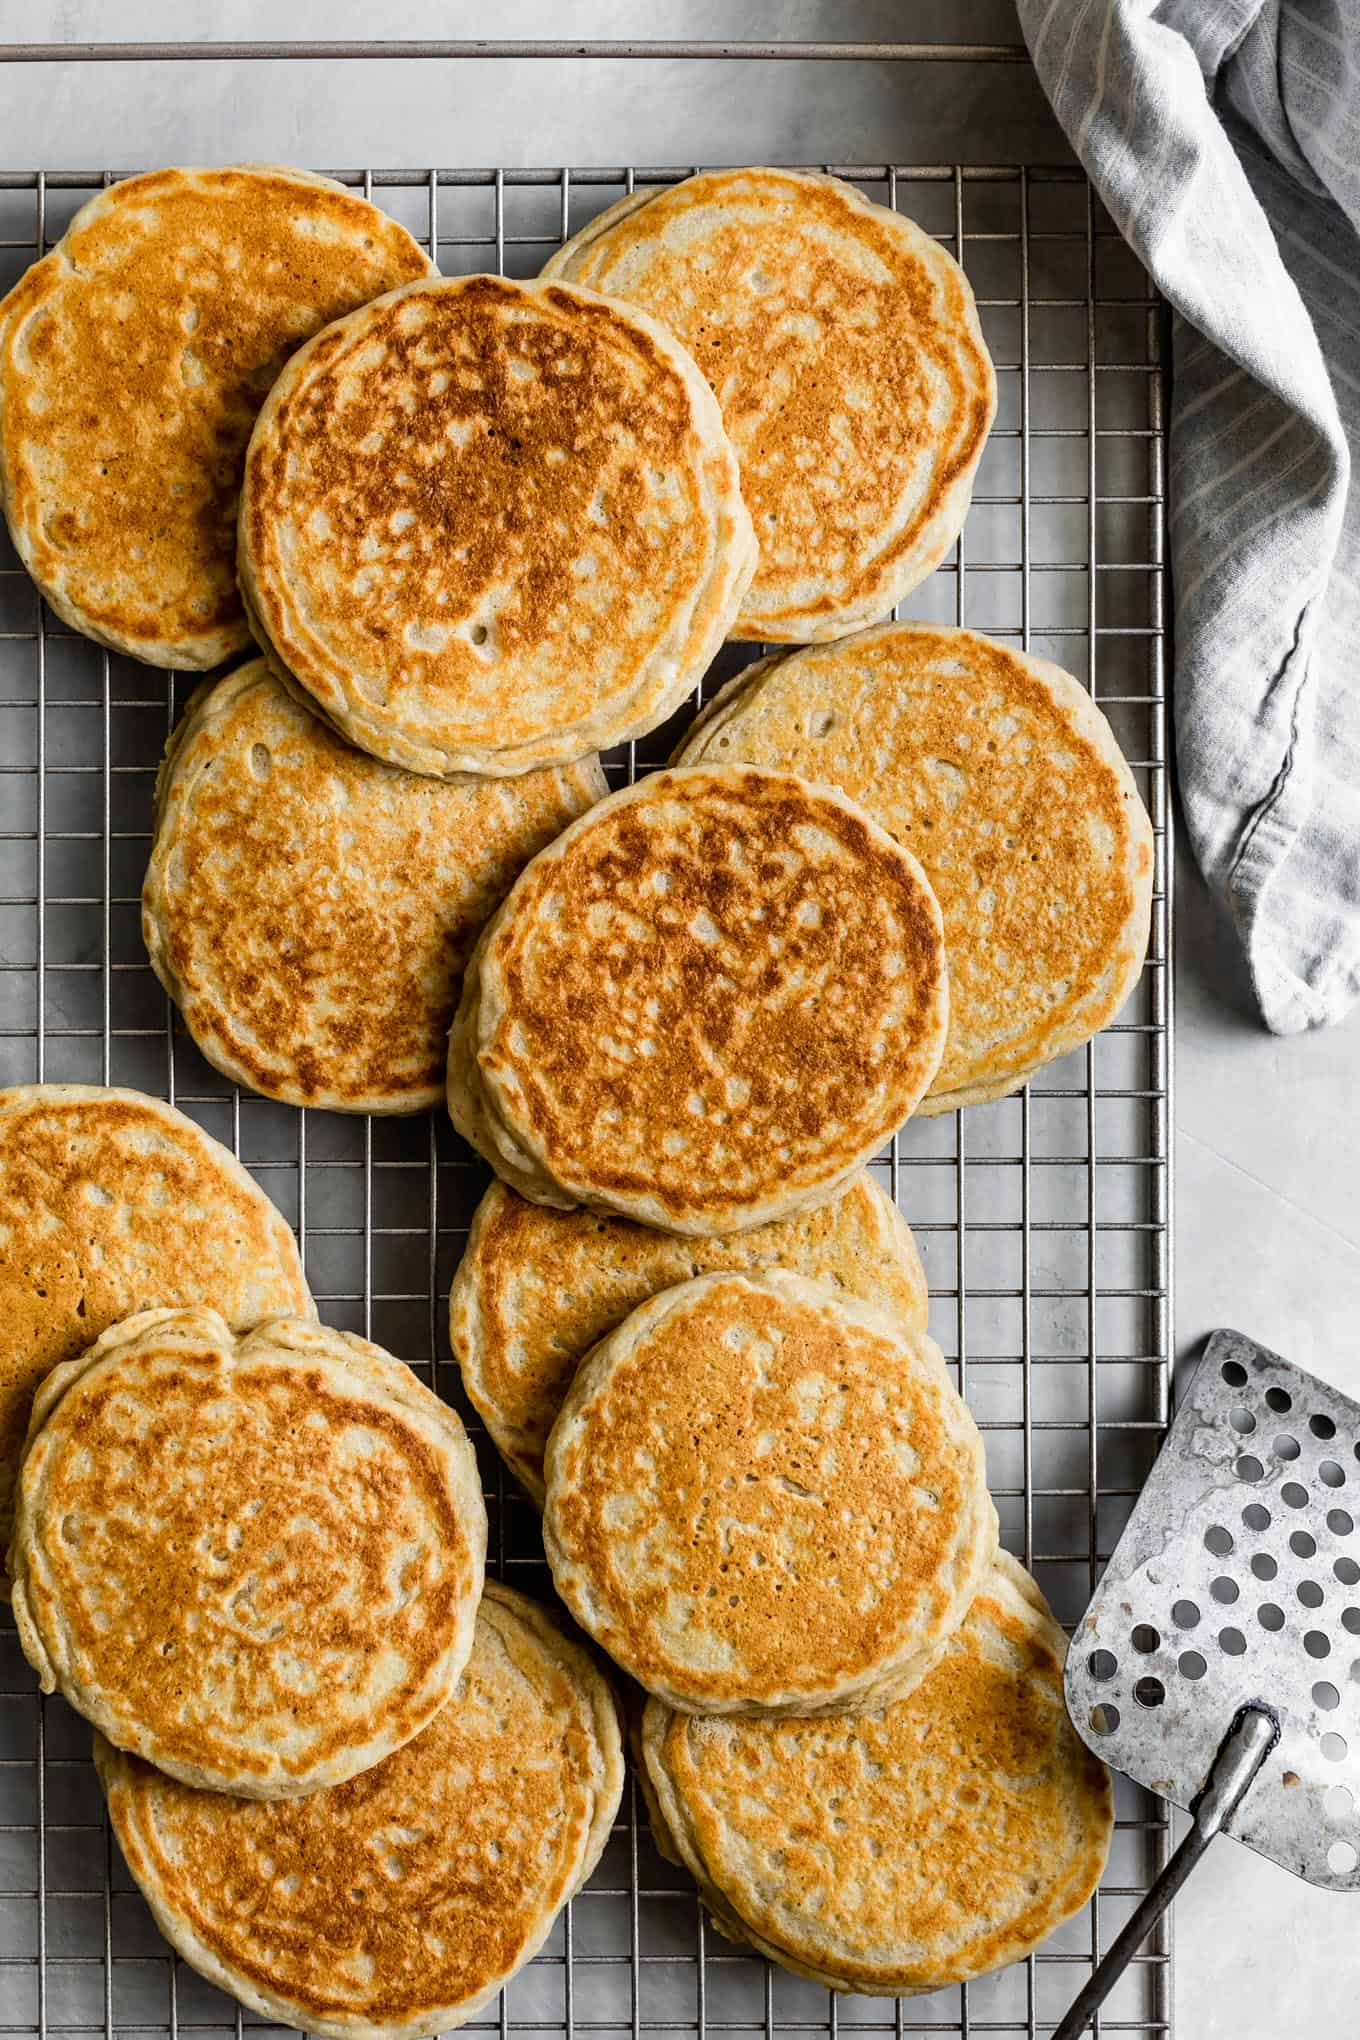 Cooling gluten-free buttermilk pancakes